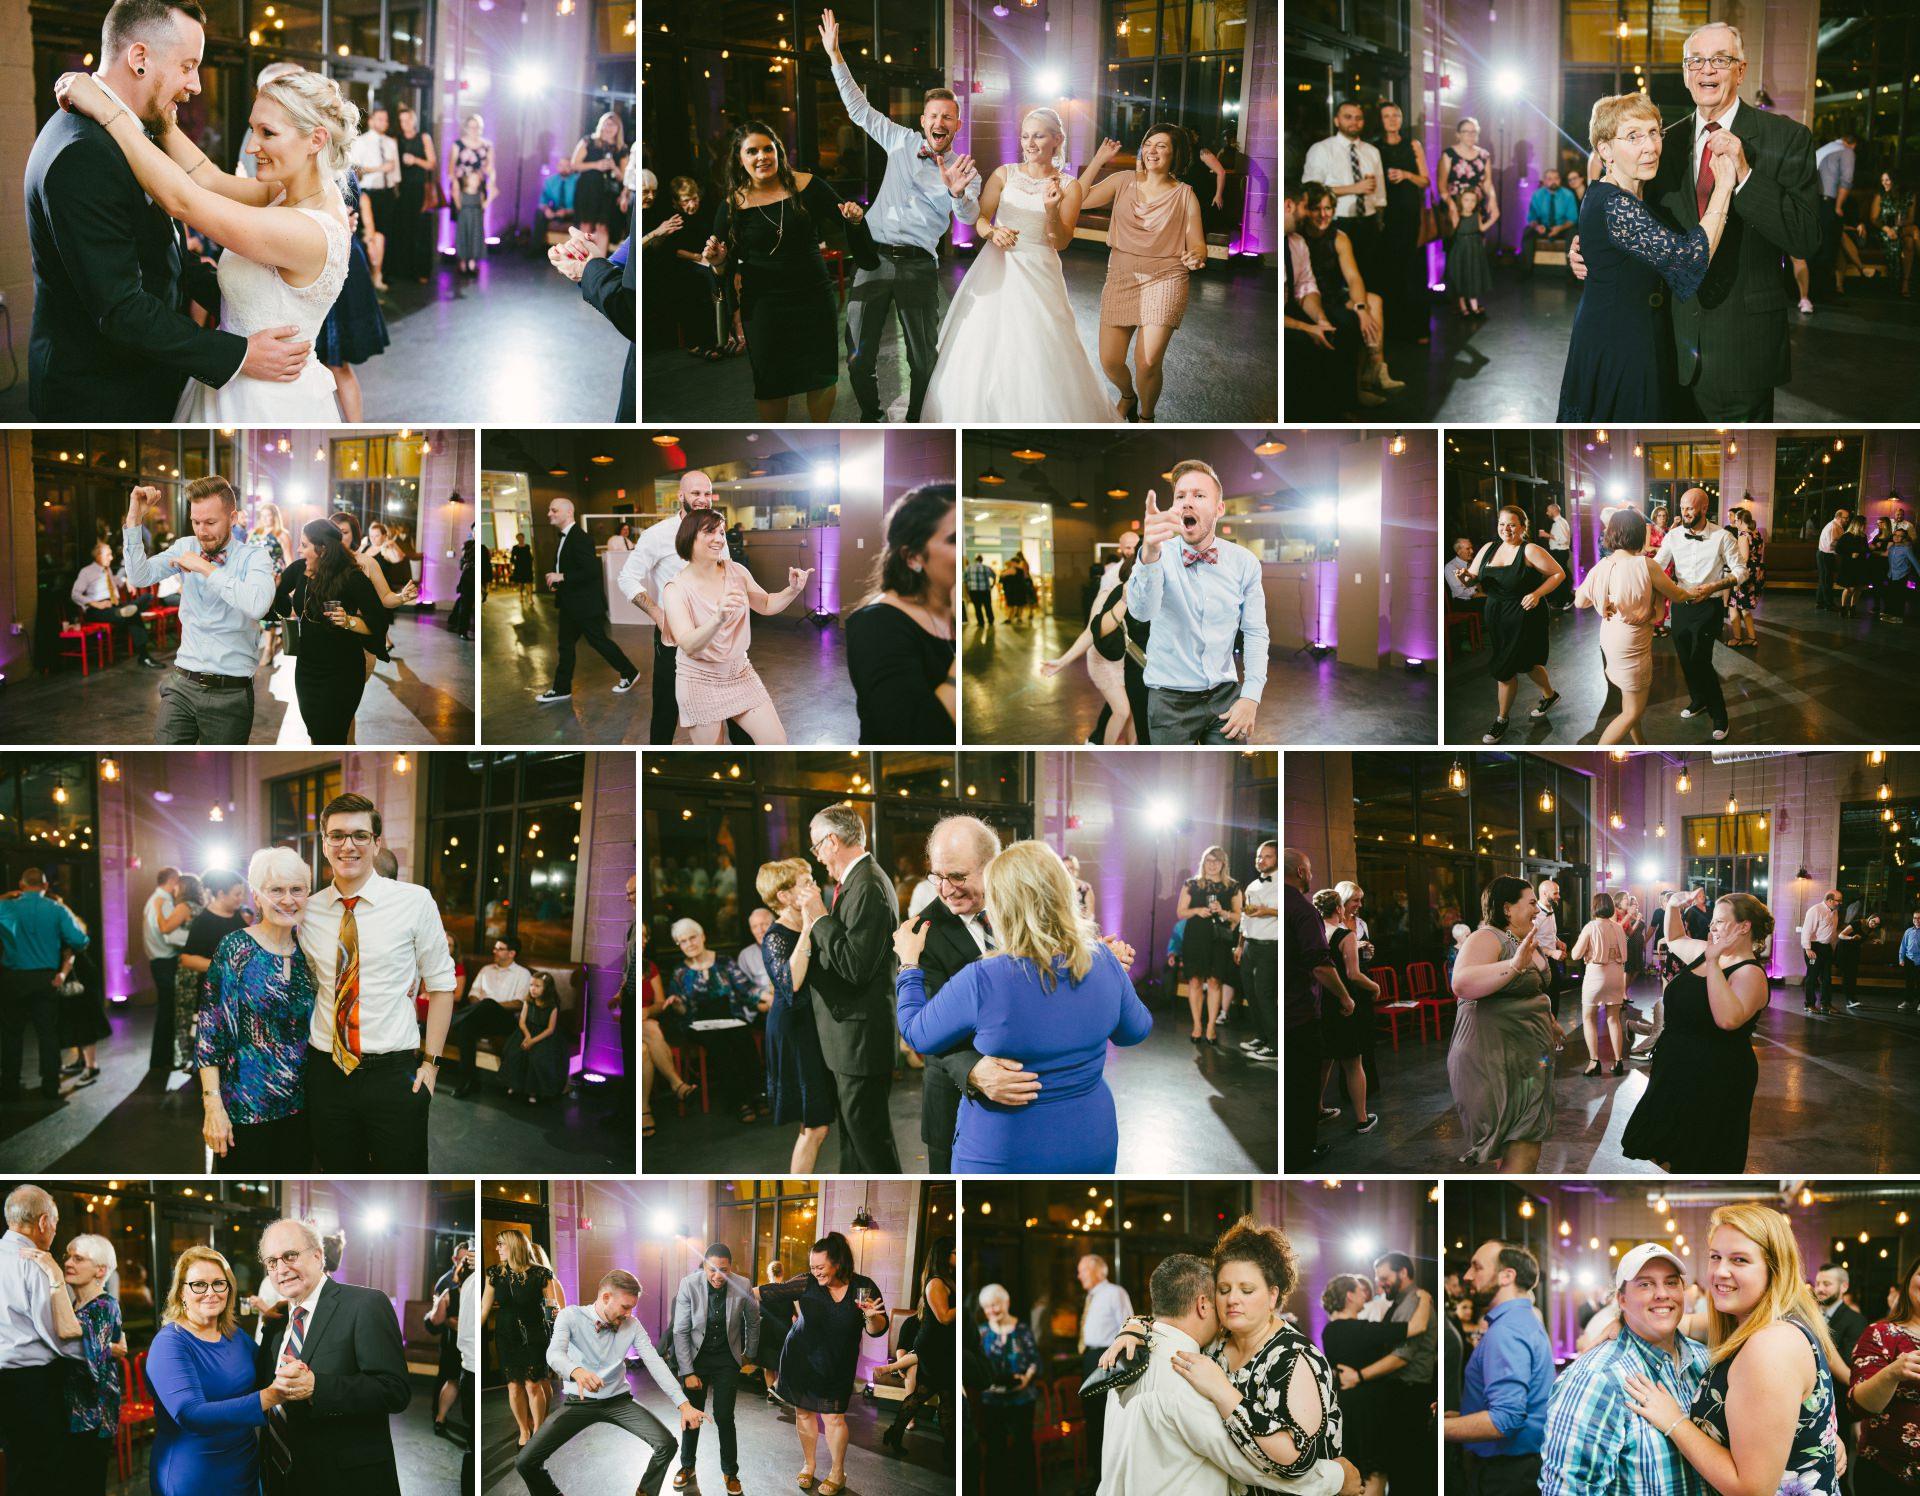 Goldhorn Brewery Wedding Photos in Cleveland 2 45.jpg